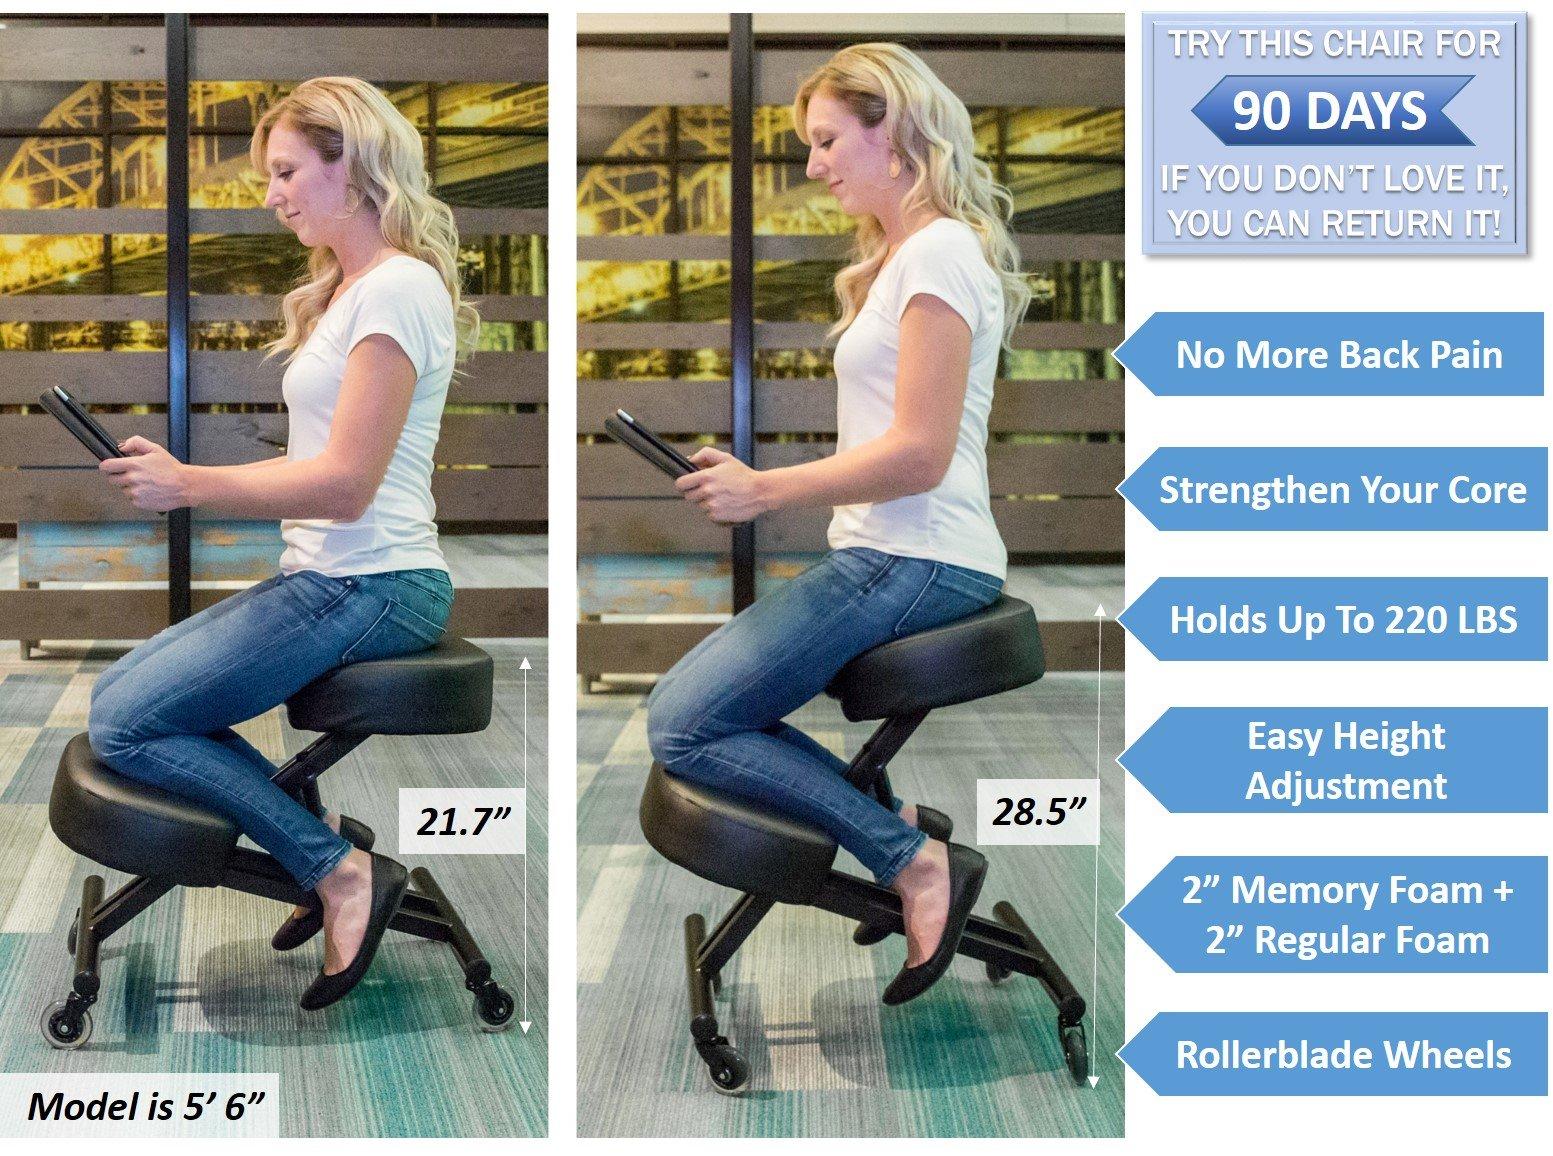 Sleekform Ergonomic Kneeling Chair M2 (Memory/Regular Foam), Adjustable Stool for Home, Office, and Meditation by Sleekform (Image #4)